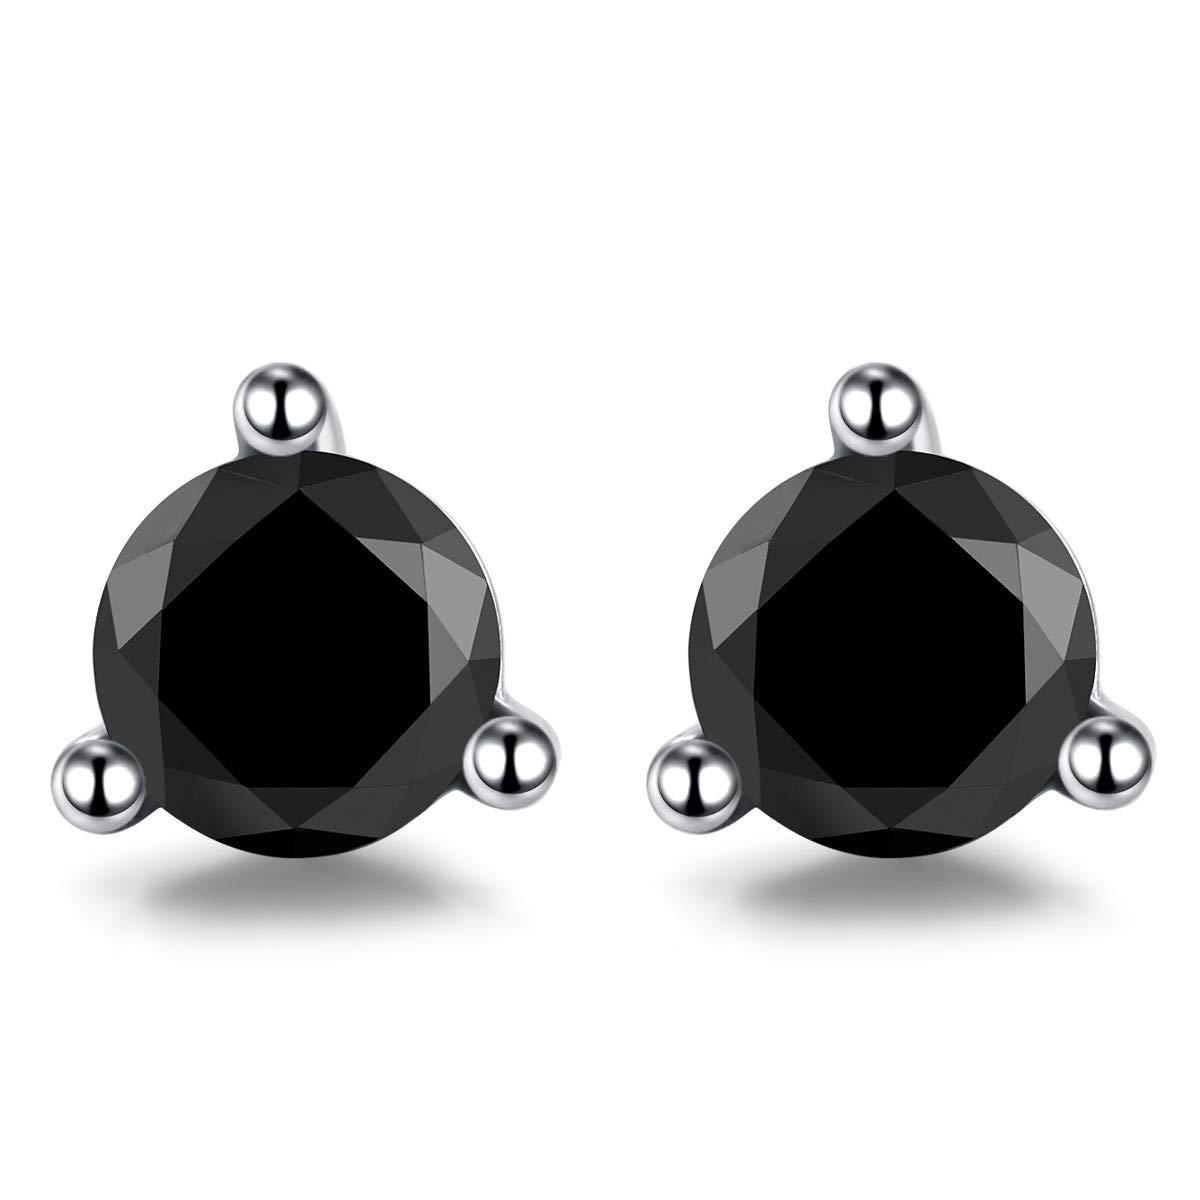 Vignye Sterling Silver Circular Cut Cubic Zirconia Stud Earrings Fashionable Black Triangle Zirconia Earrings